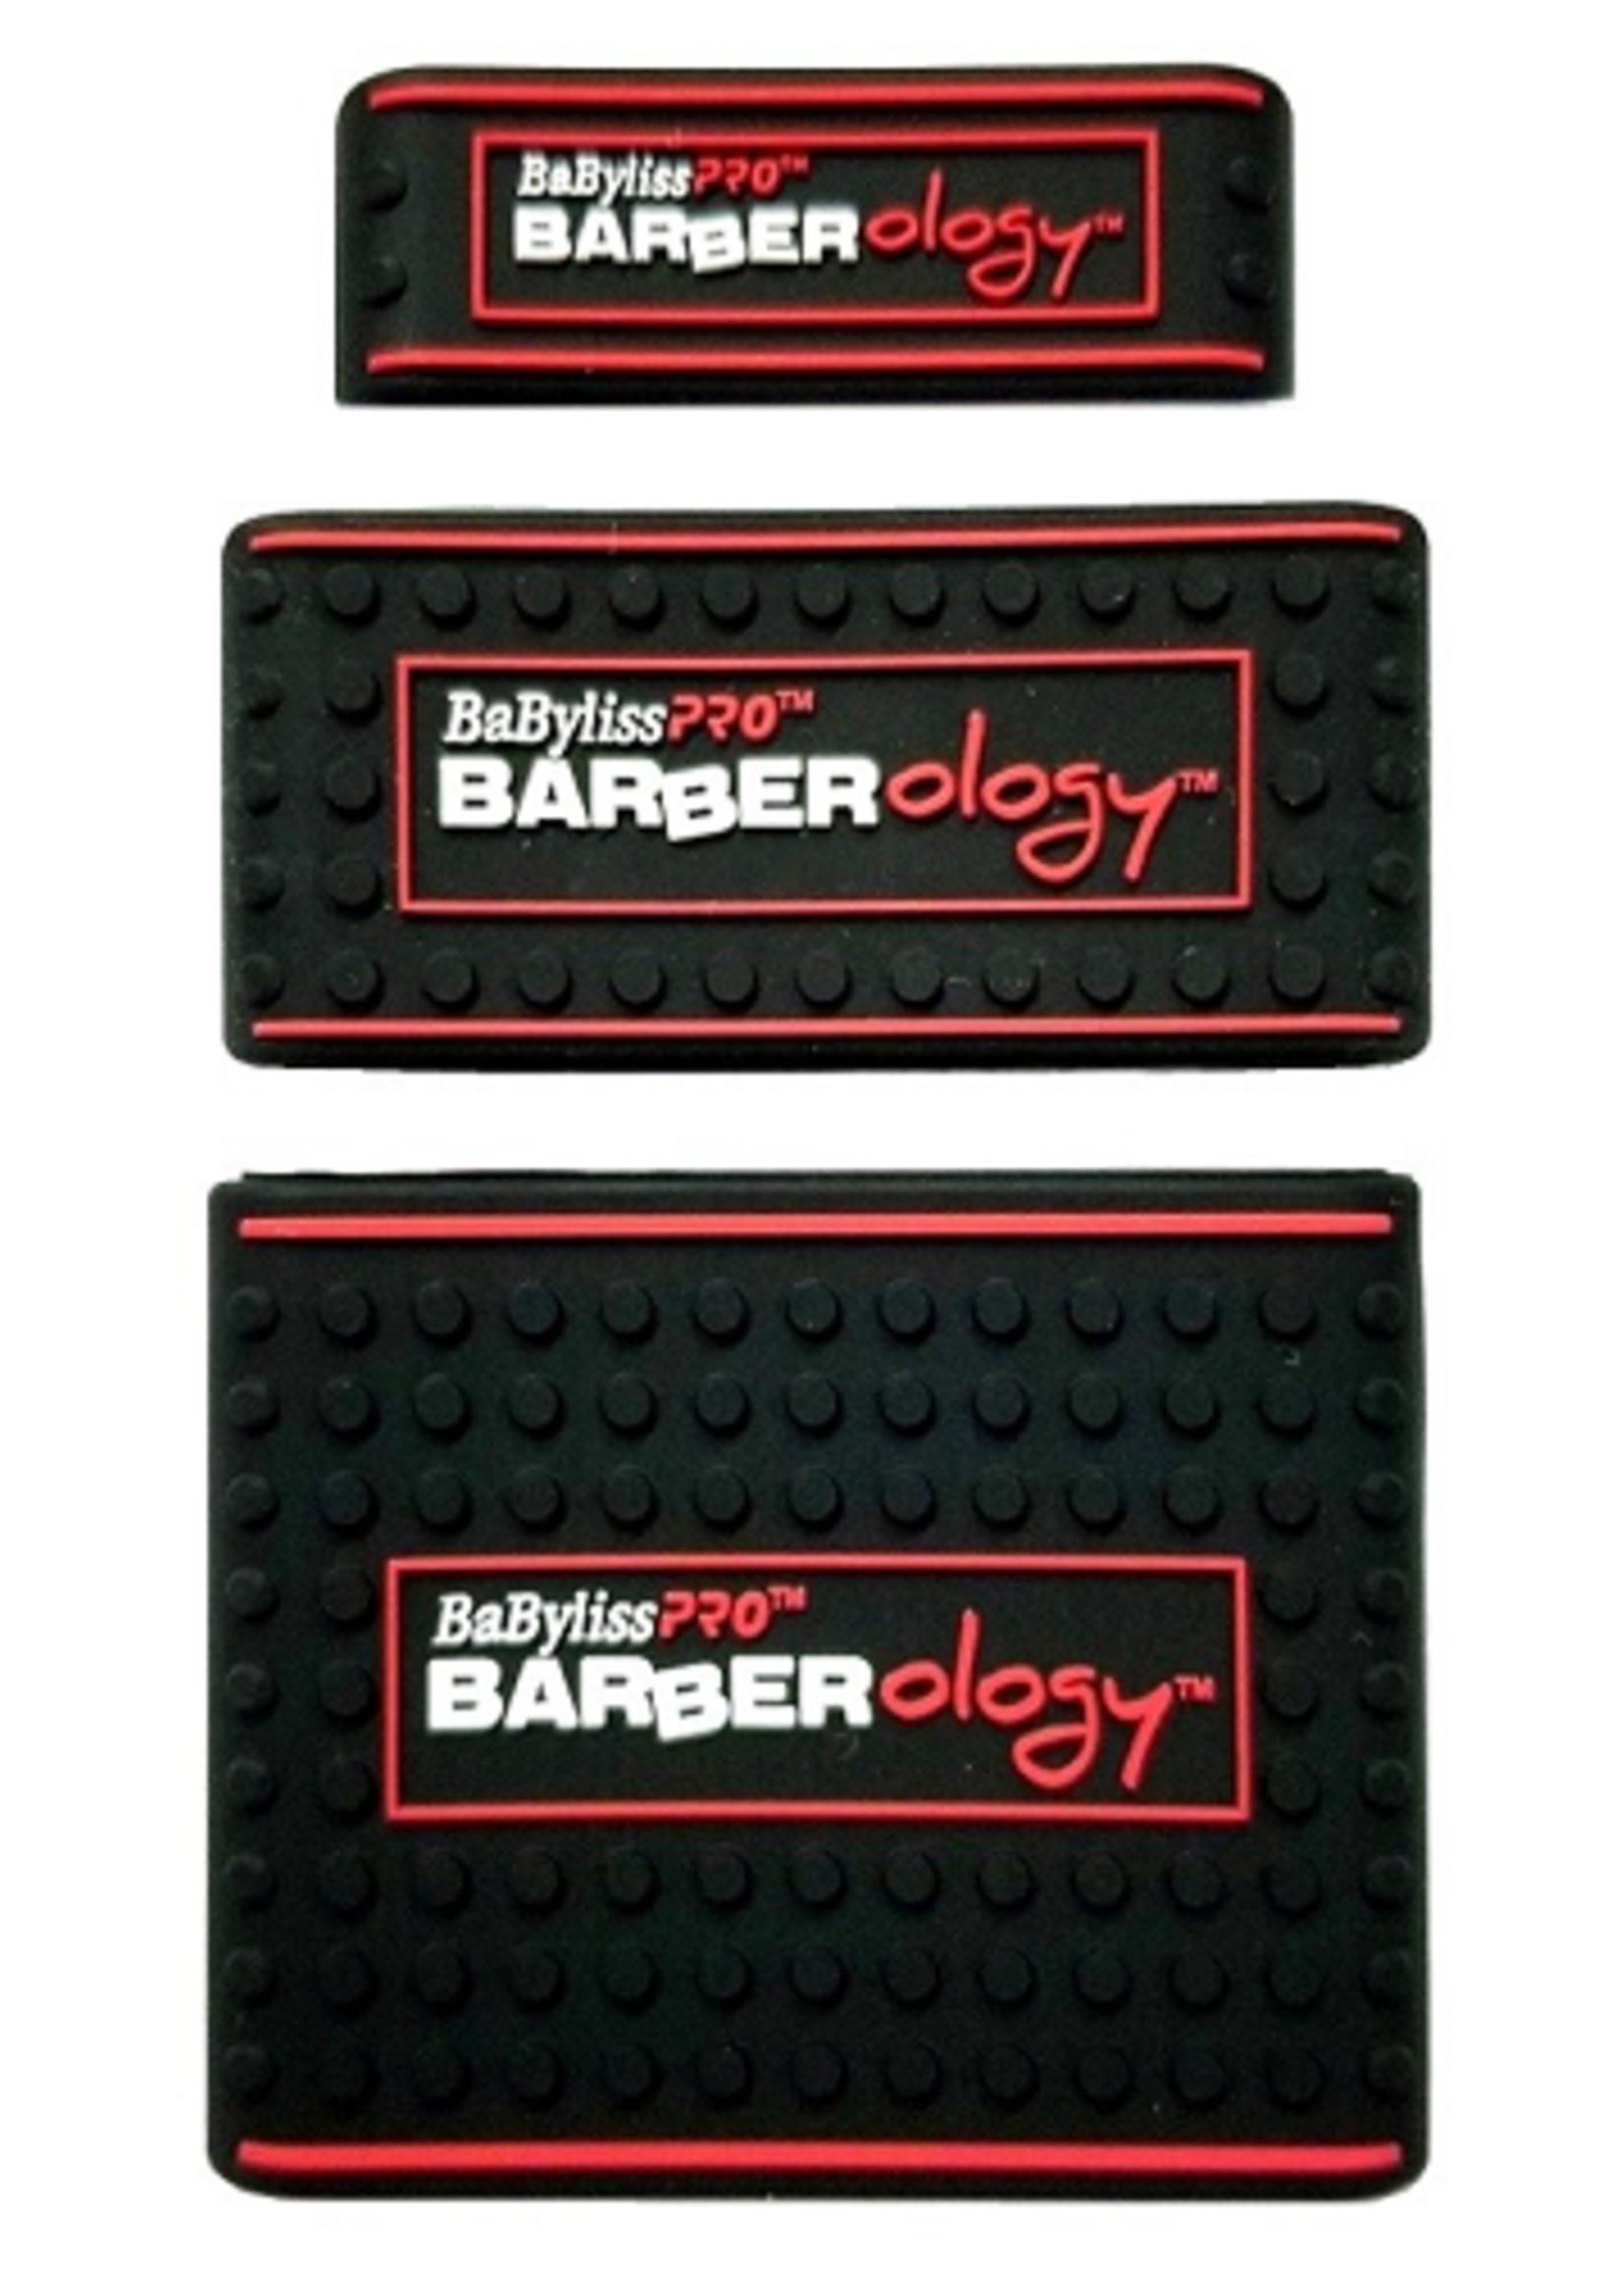 BabylissPro Barberology Clipper Grips- 3pk